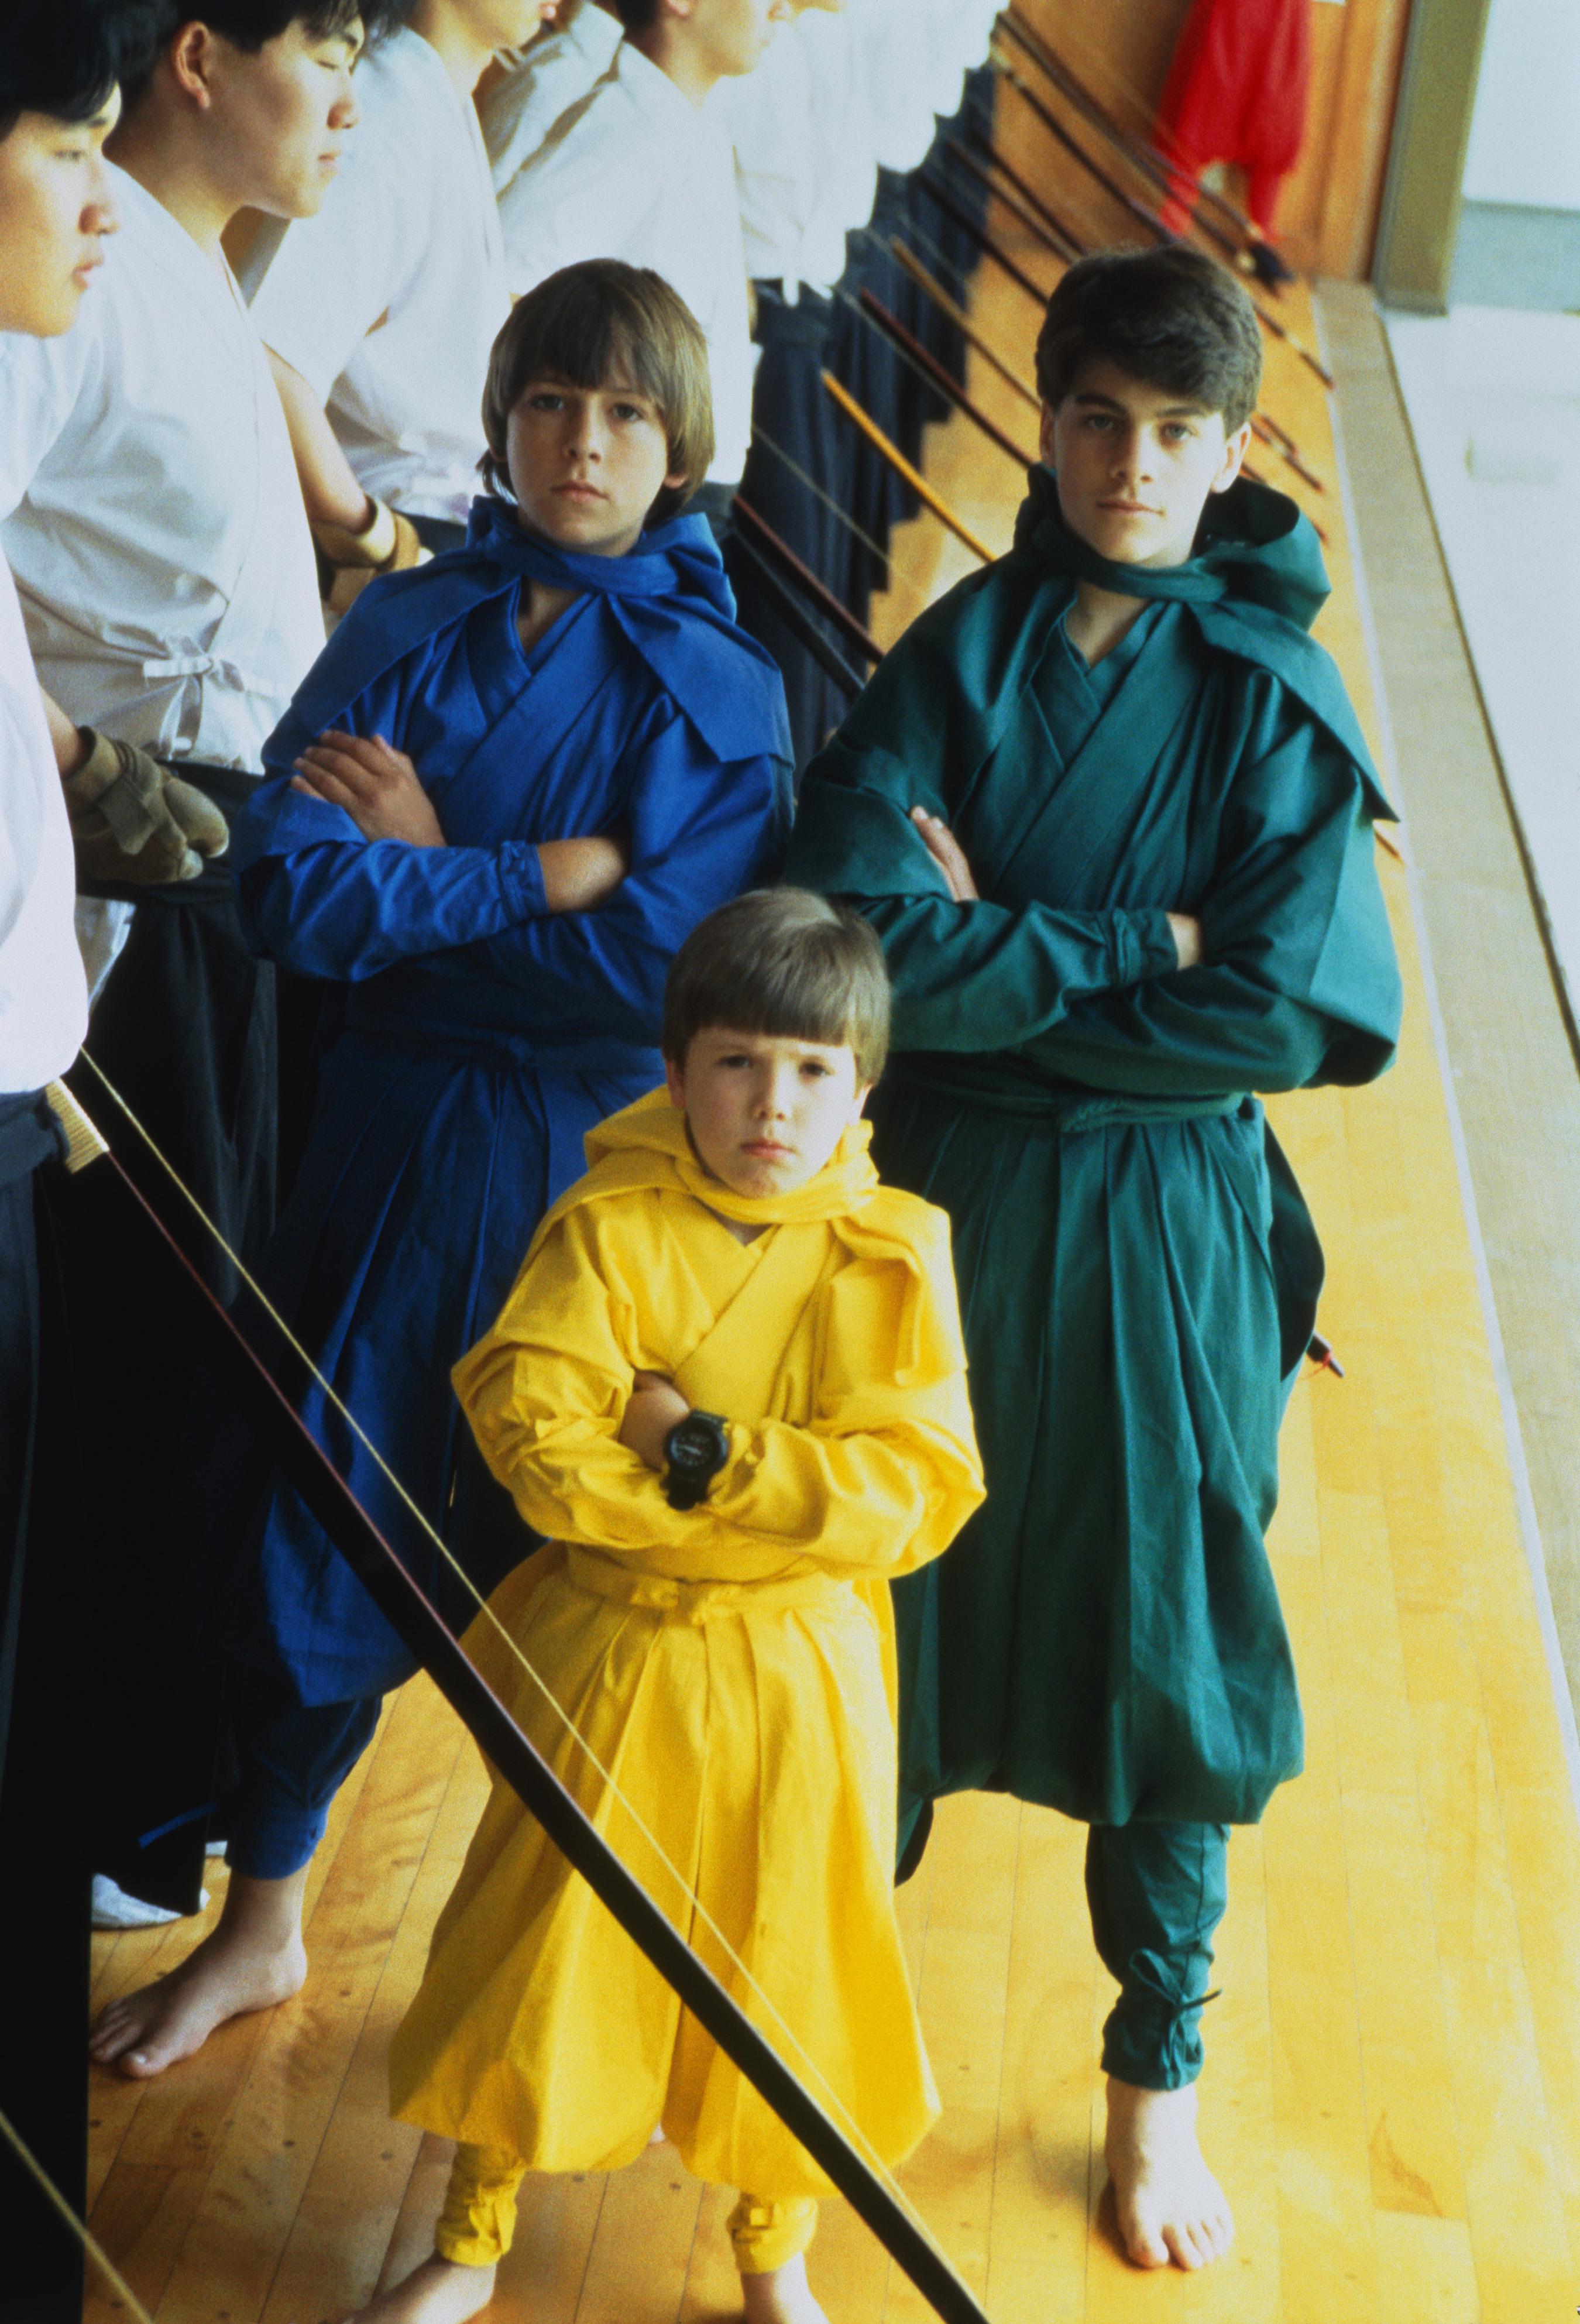 J. Evan Bonifant, Sean Fox, and Max Elliott Slade in 3 Ninjas Kick Back (1994)